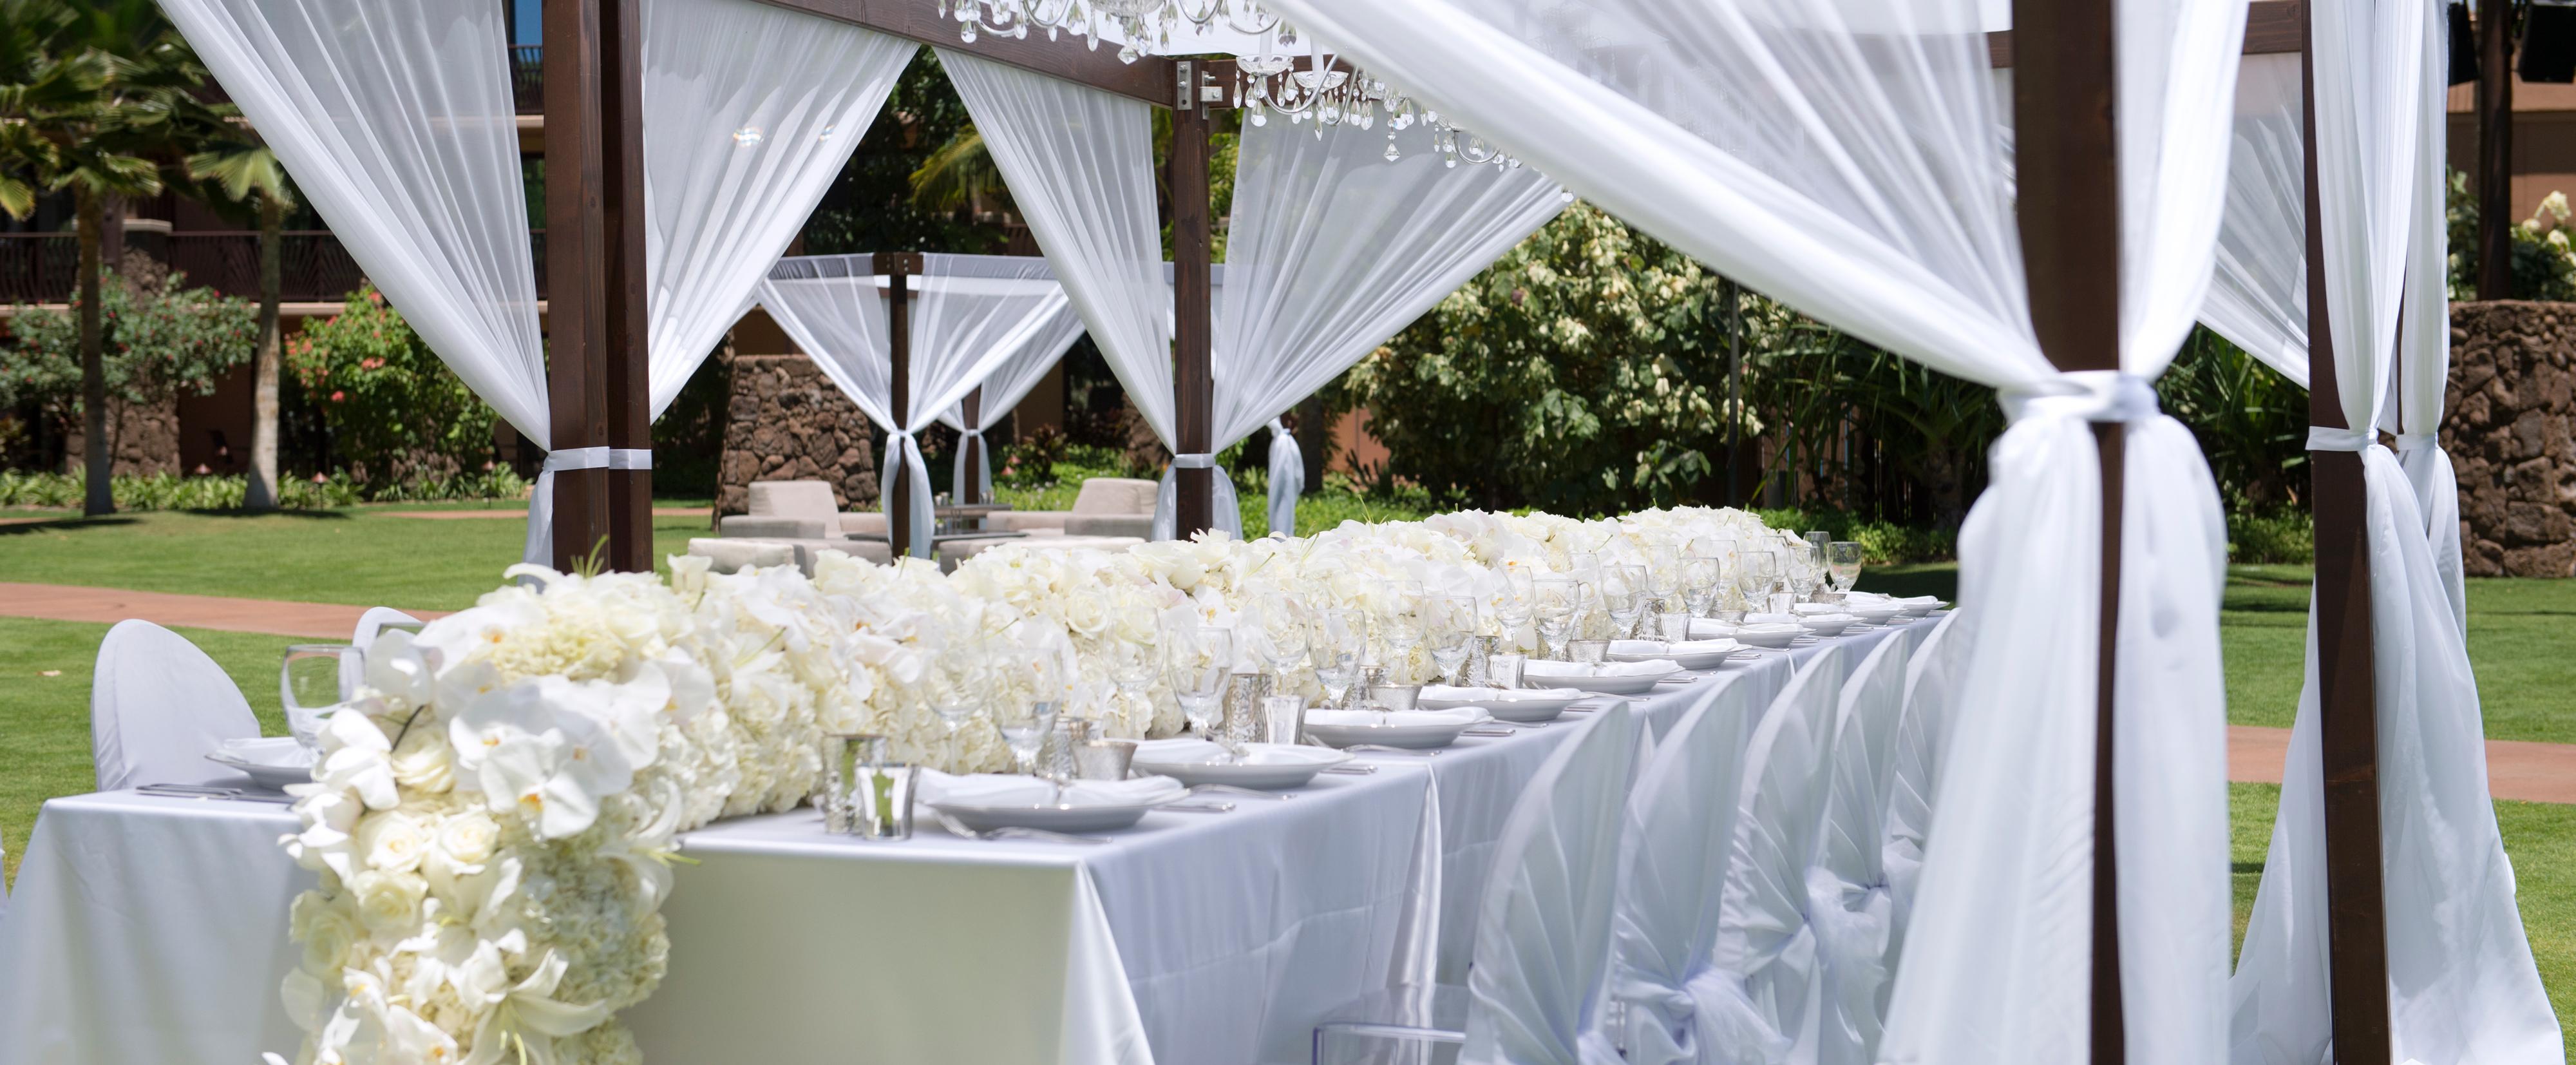 Weddings Amp Special Events Aulani Hawaii Resort Amp Spa